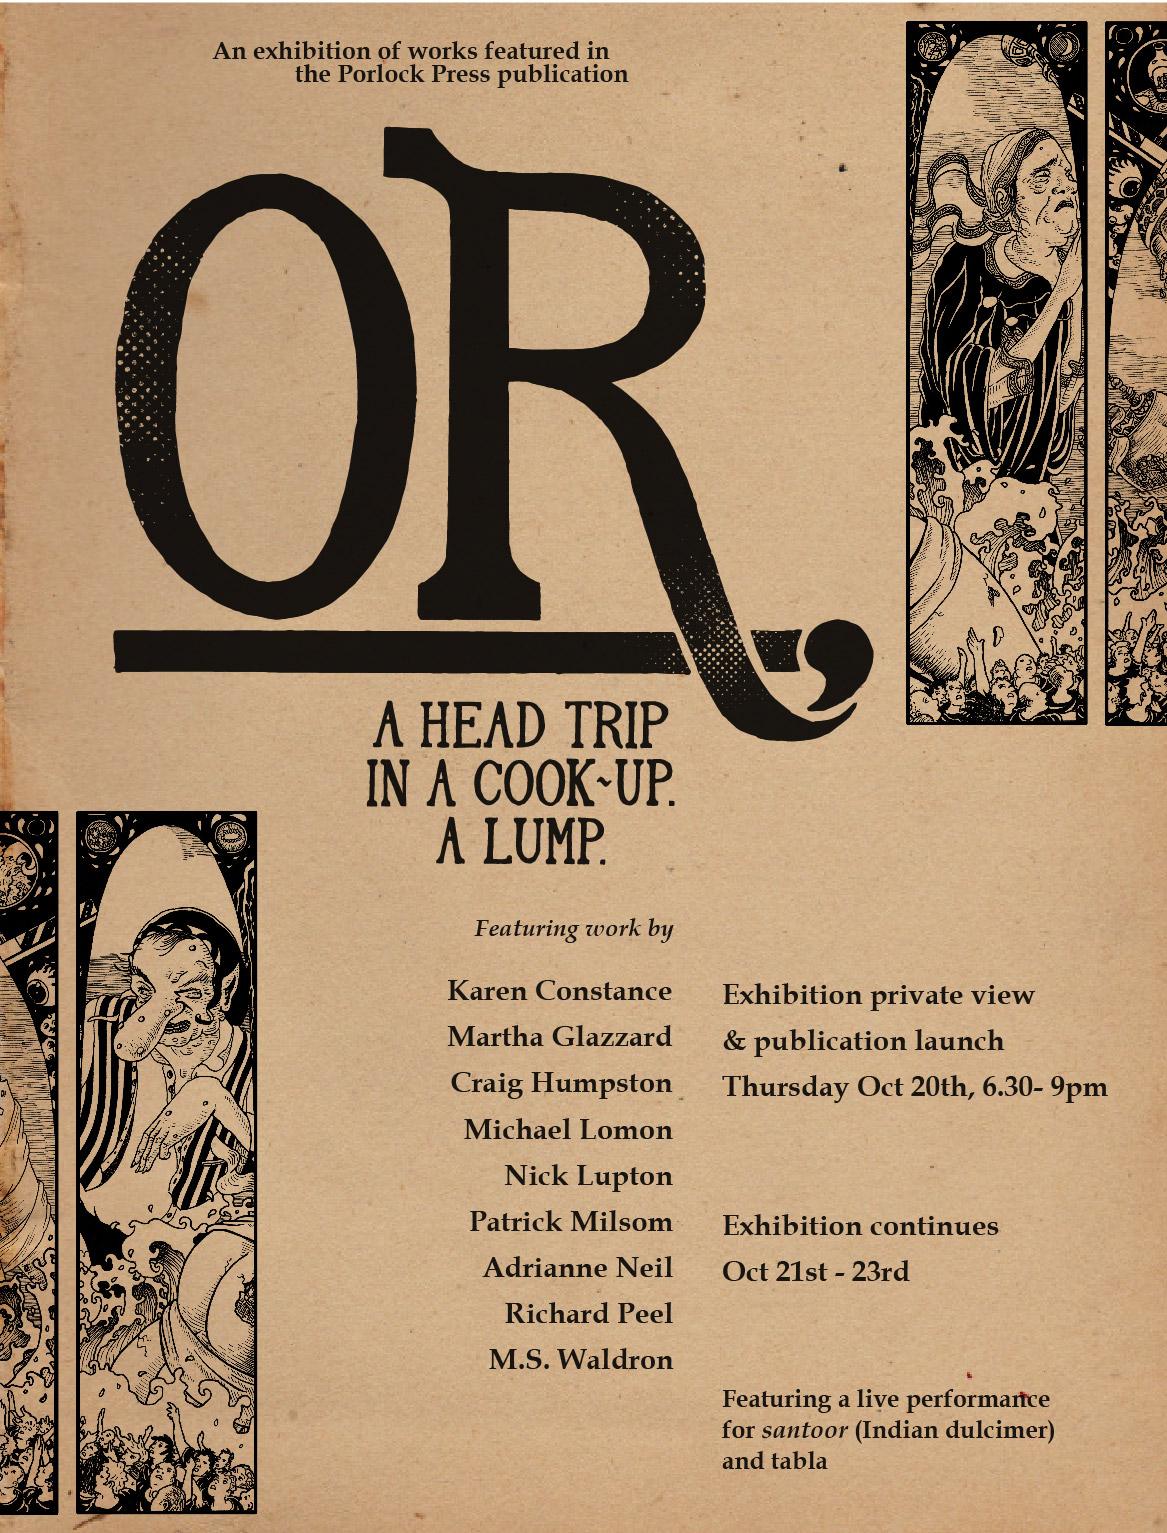 OR A HEAD TRIP IN A COOK-UP. A LUMP.